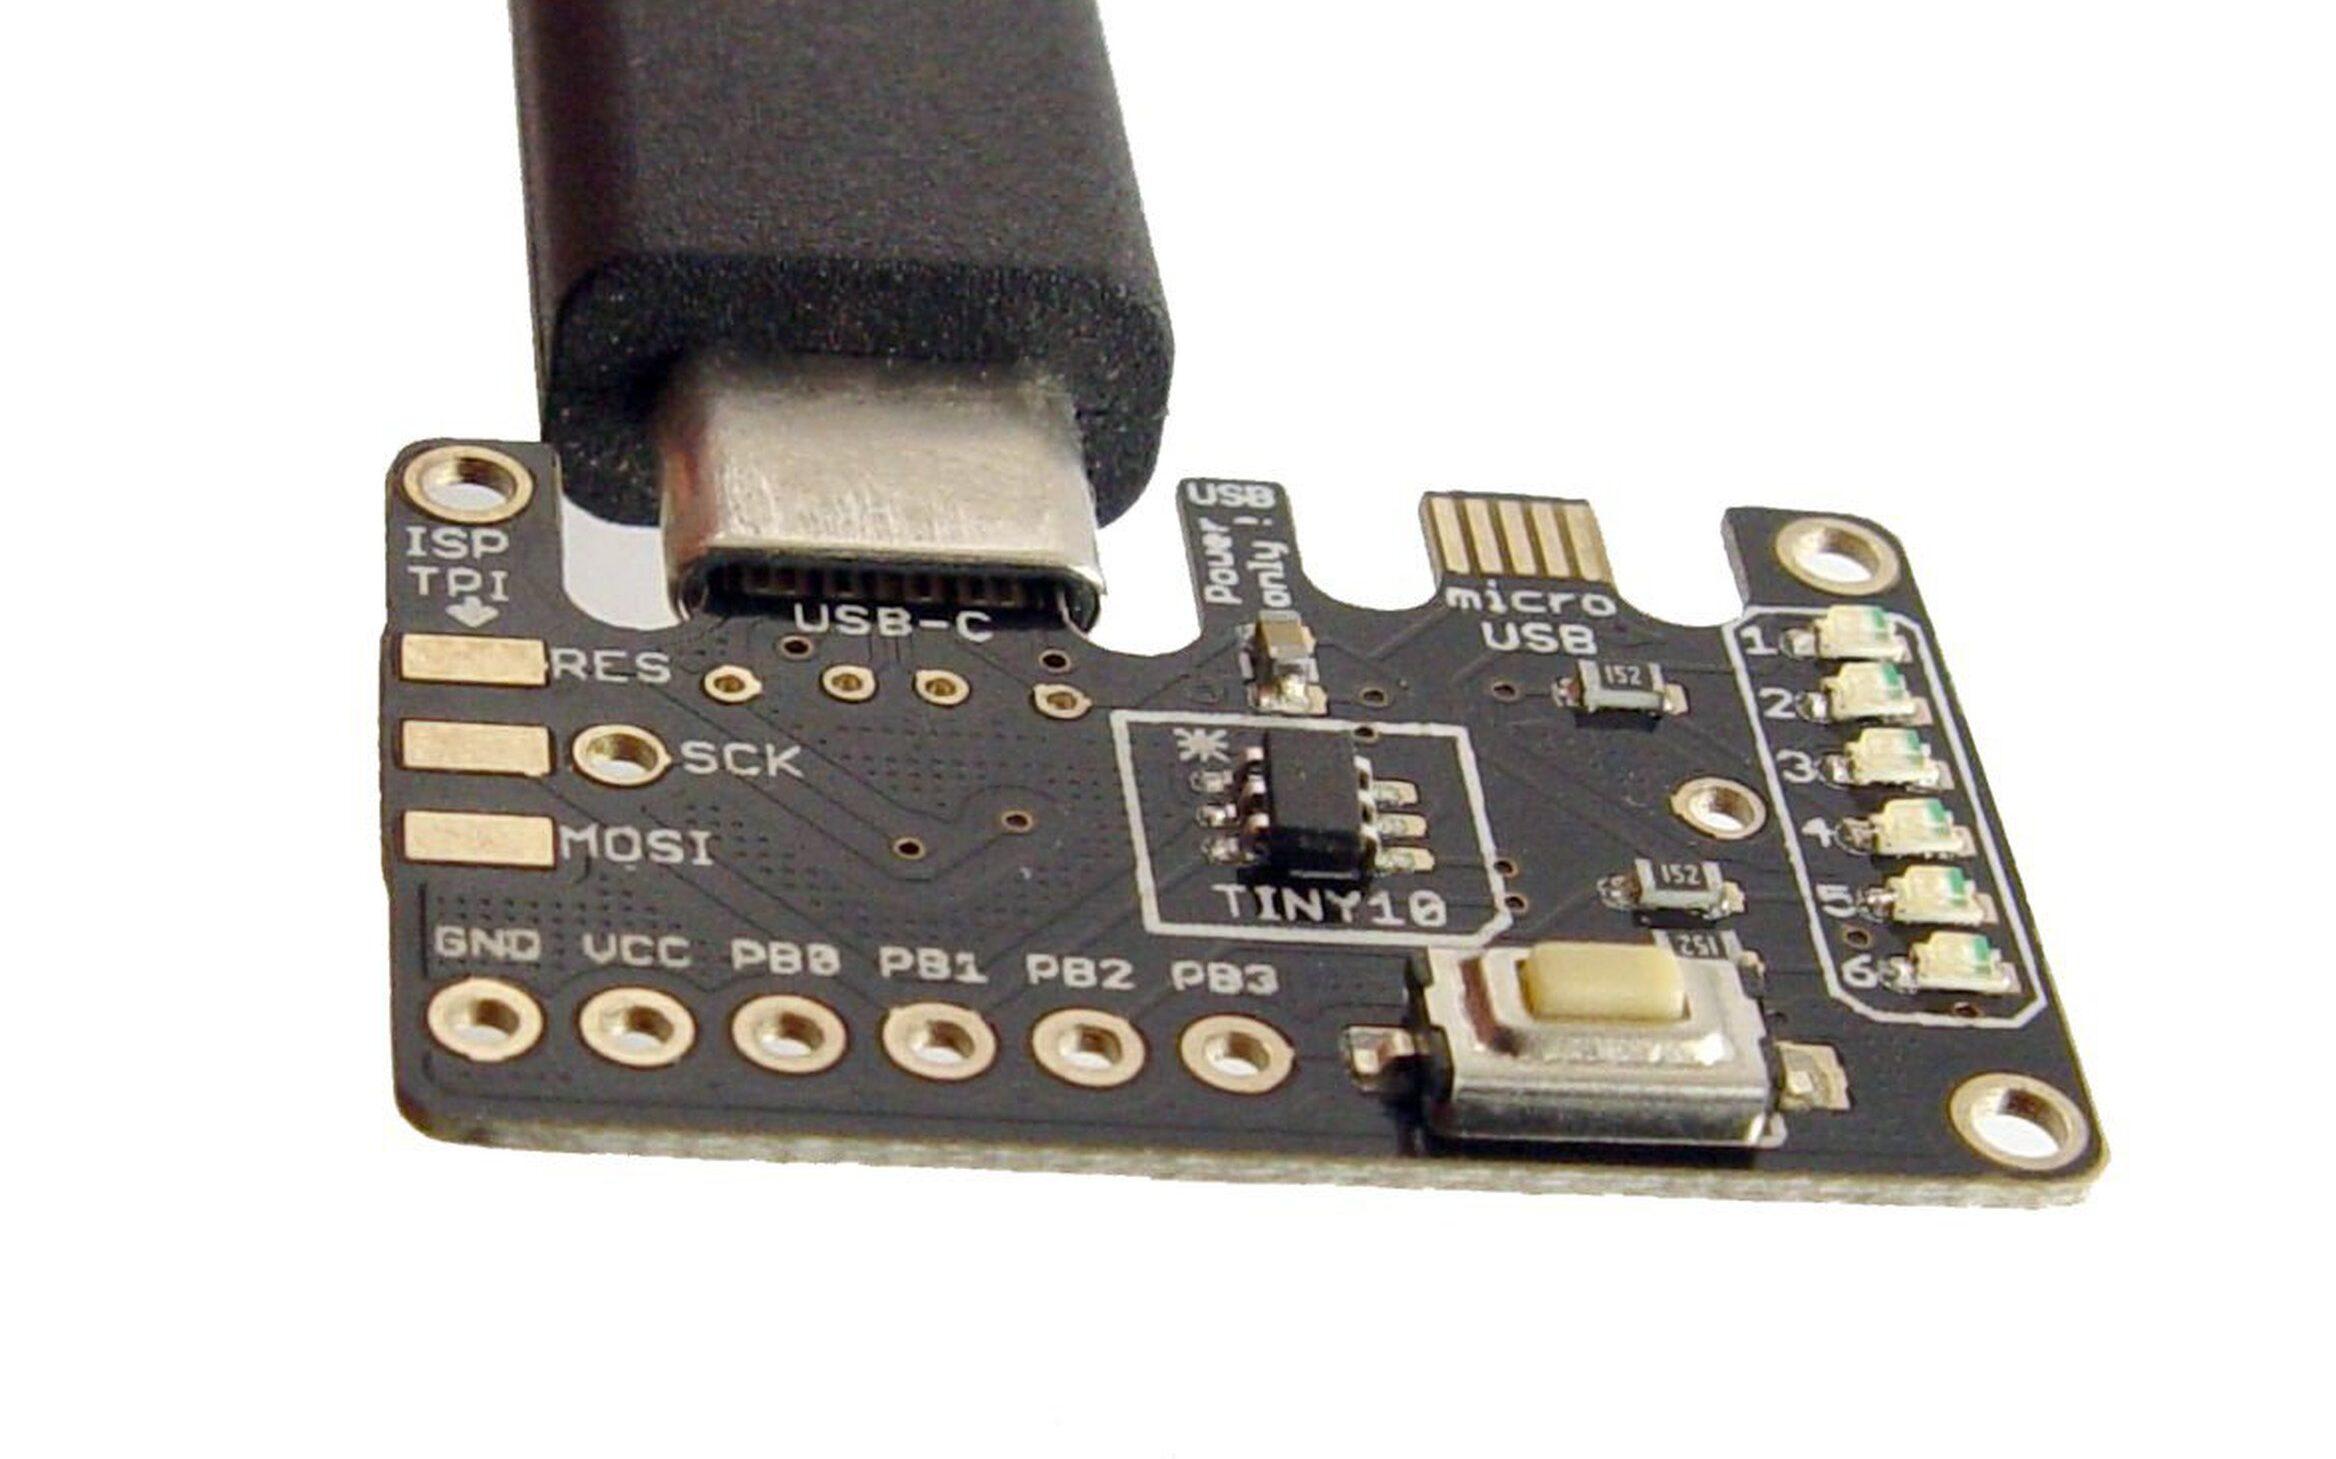 ATtiny10 Development Board with USB-C and Micro USB